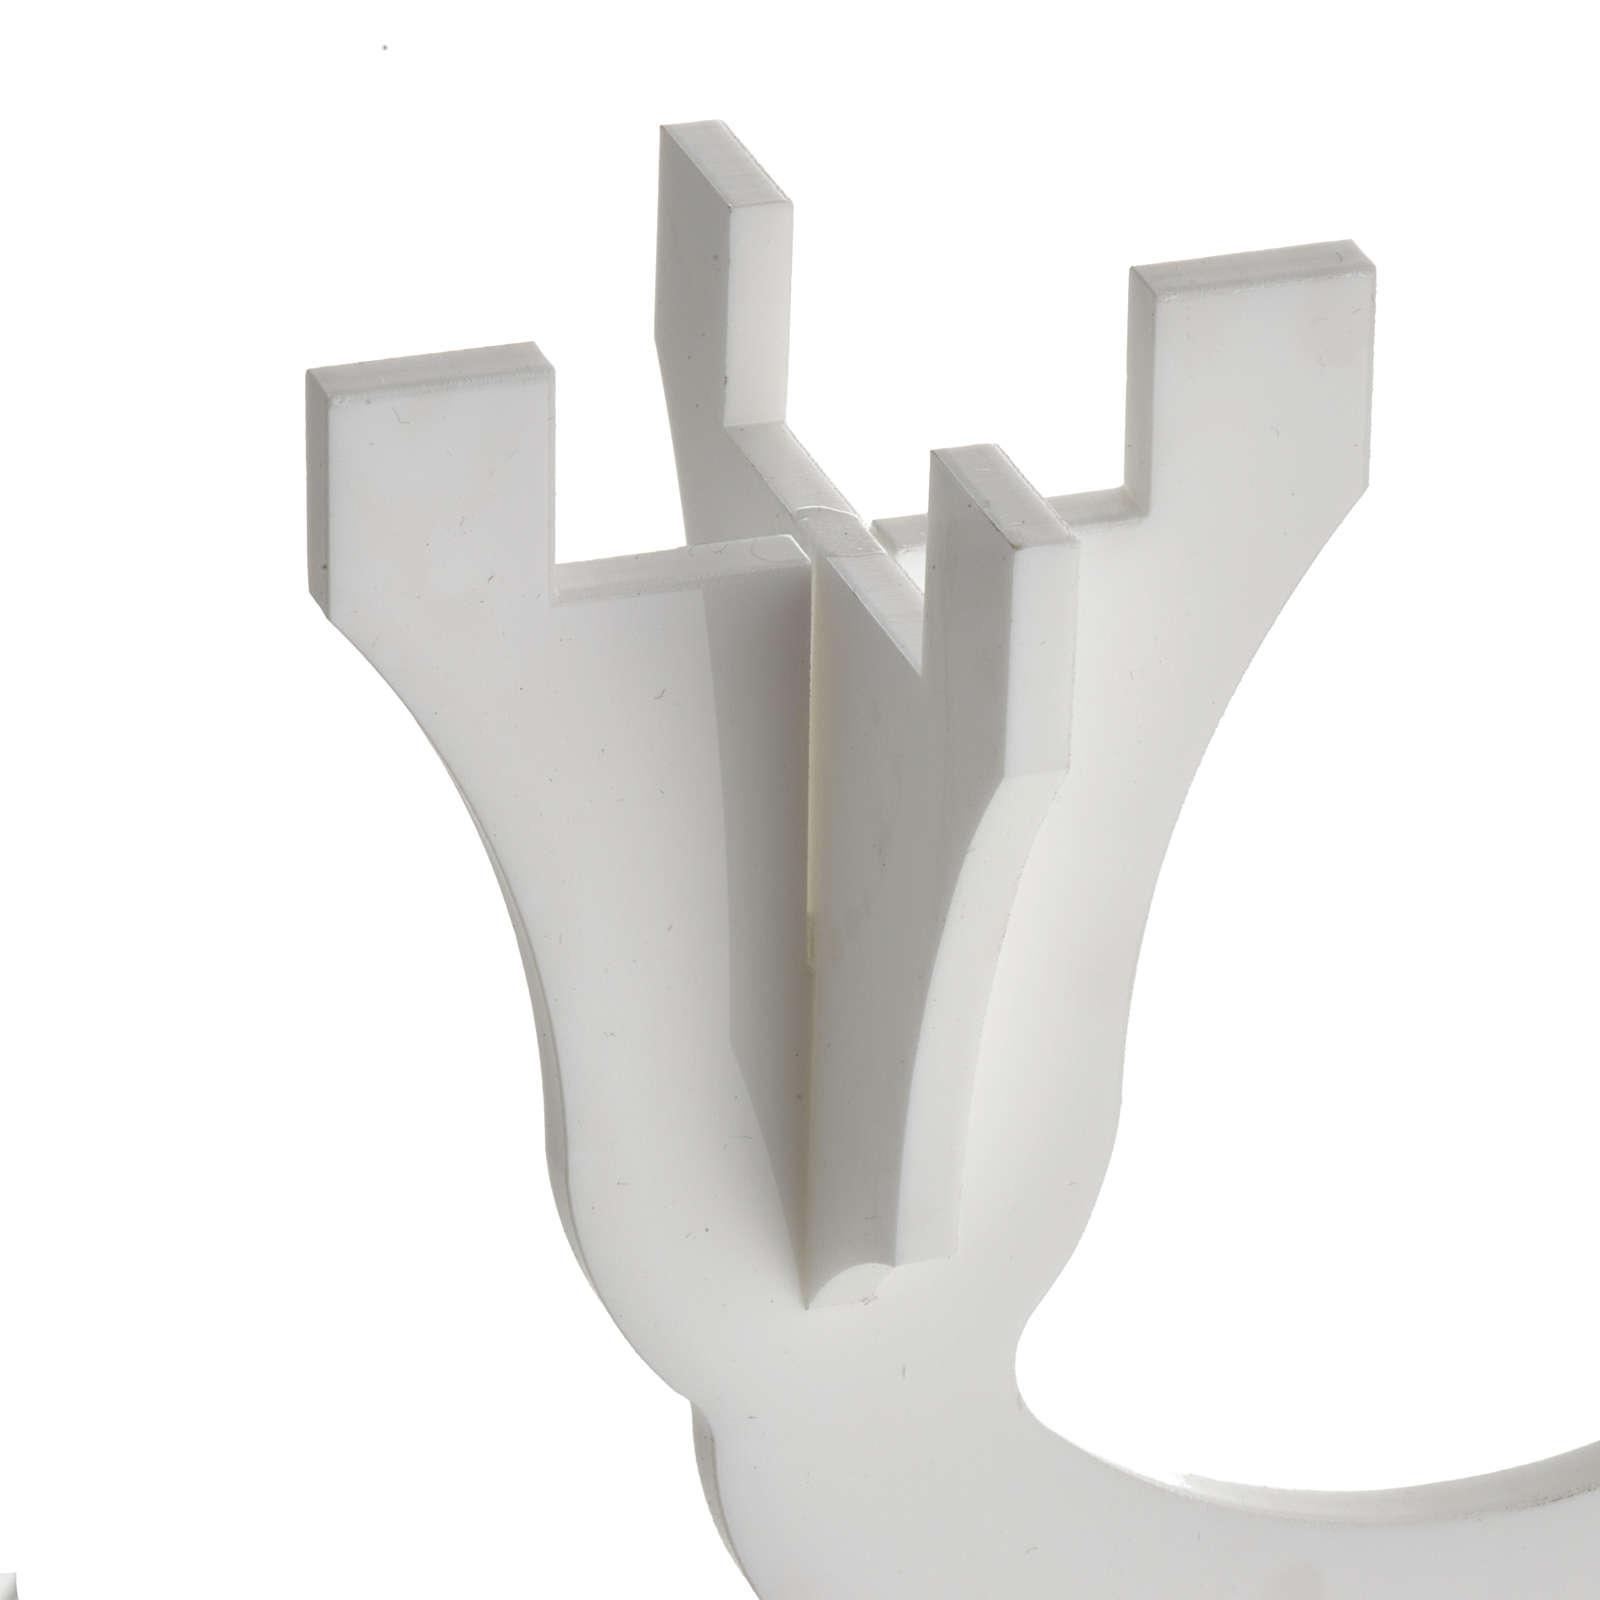 Candélabre plexiglas 3 branches blanc 4